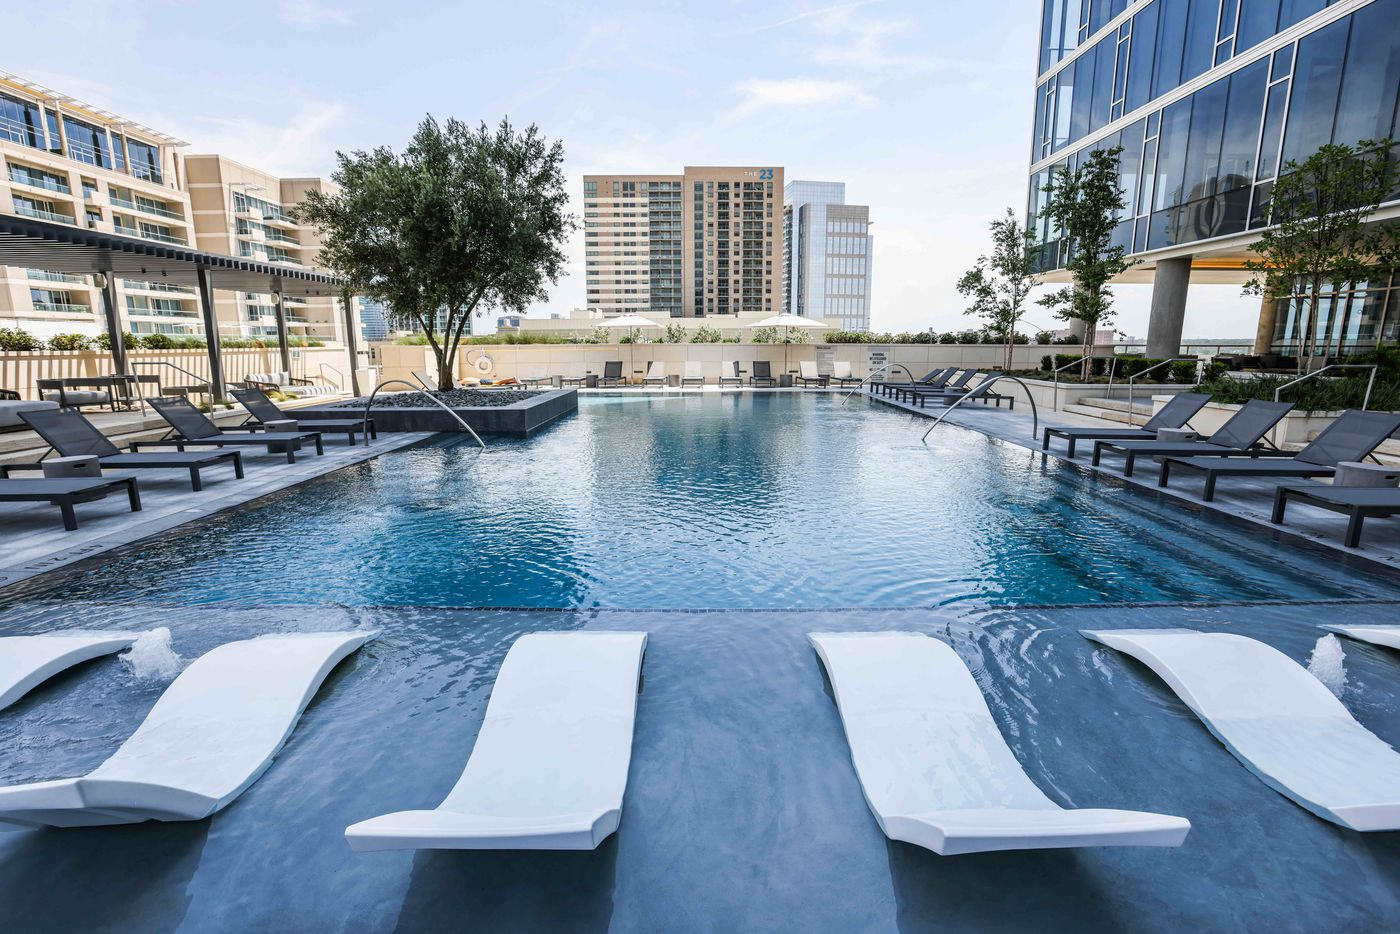 Pool at The Victor in Dallas.. (Lola Gomez/The Dallas Morning News)